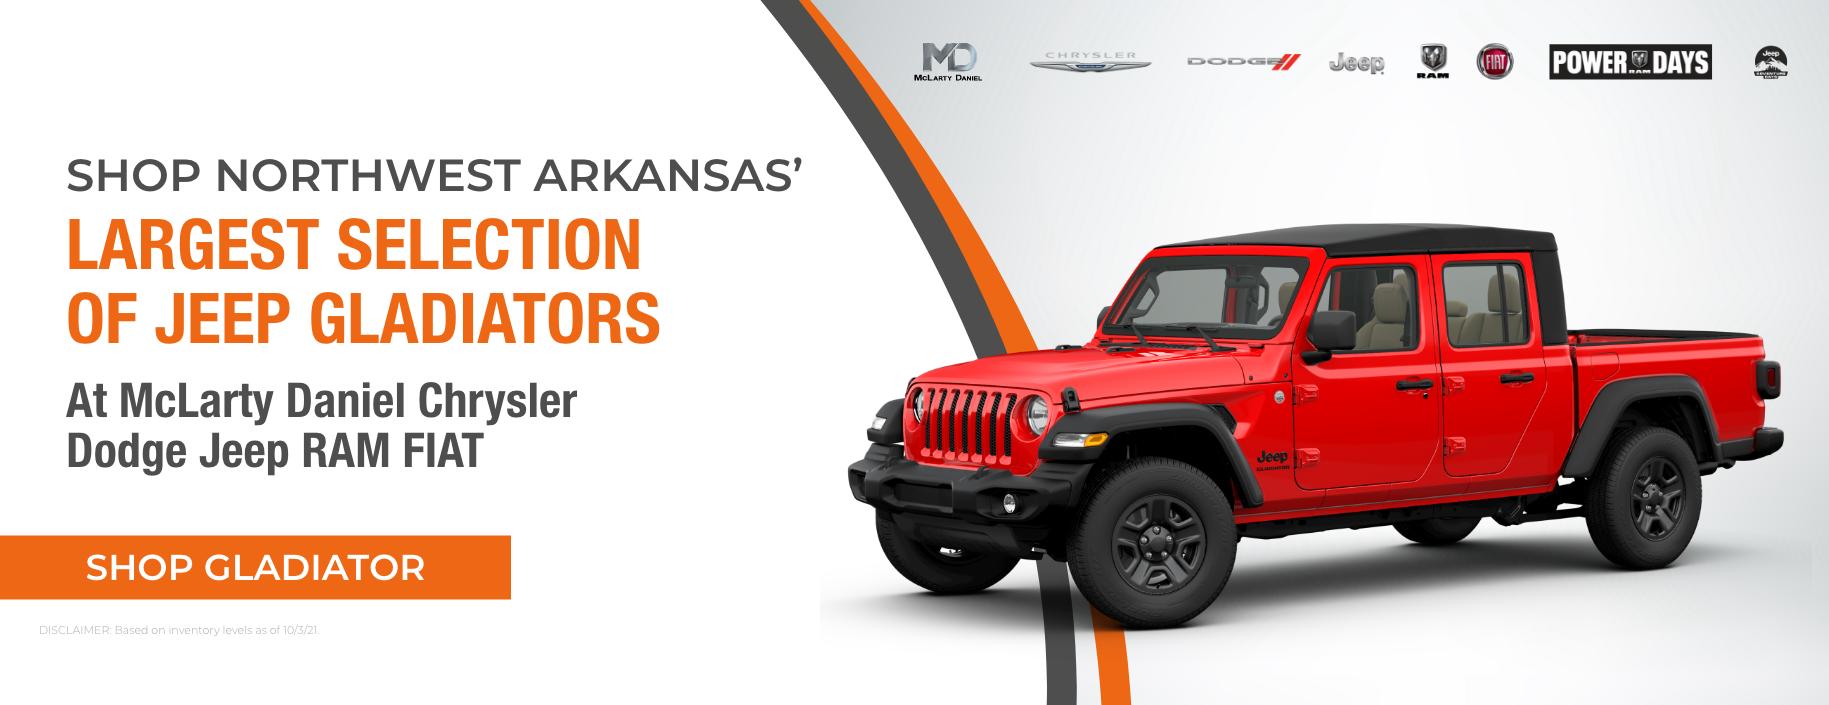 Shop Northwest Arkansas' largest selection of Jeep Gladiators at McLarty Daniel Chrysler Dodge Jeep RAM FIAT!